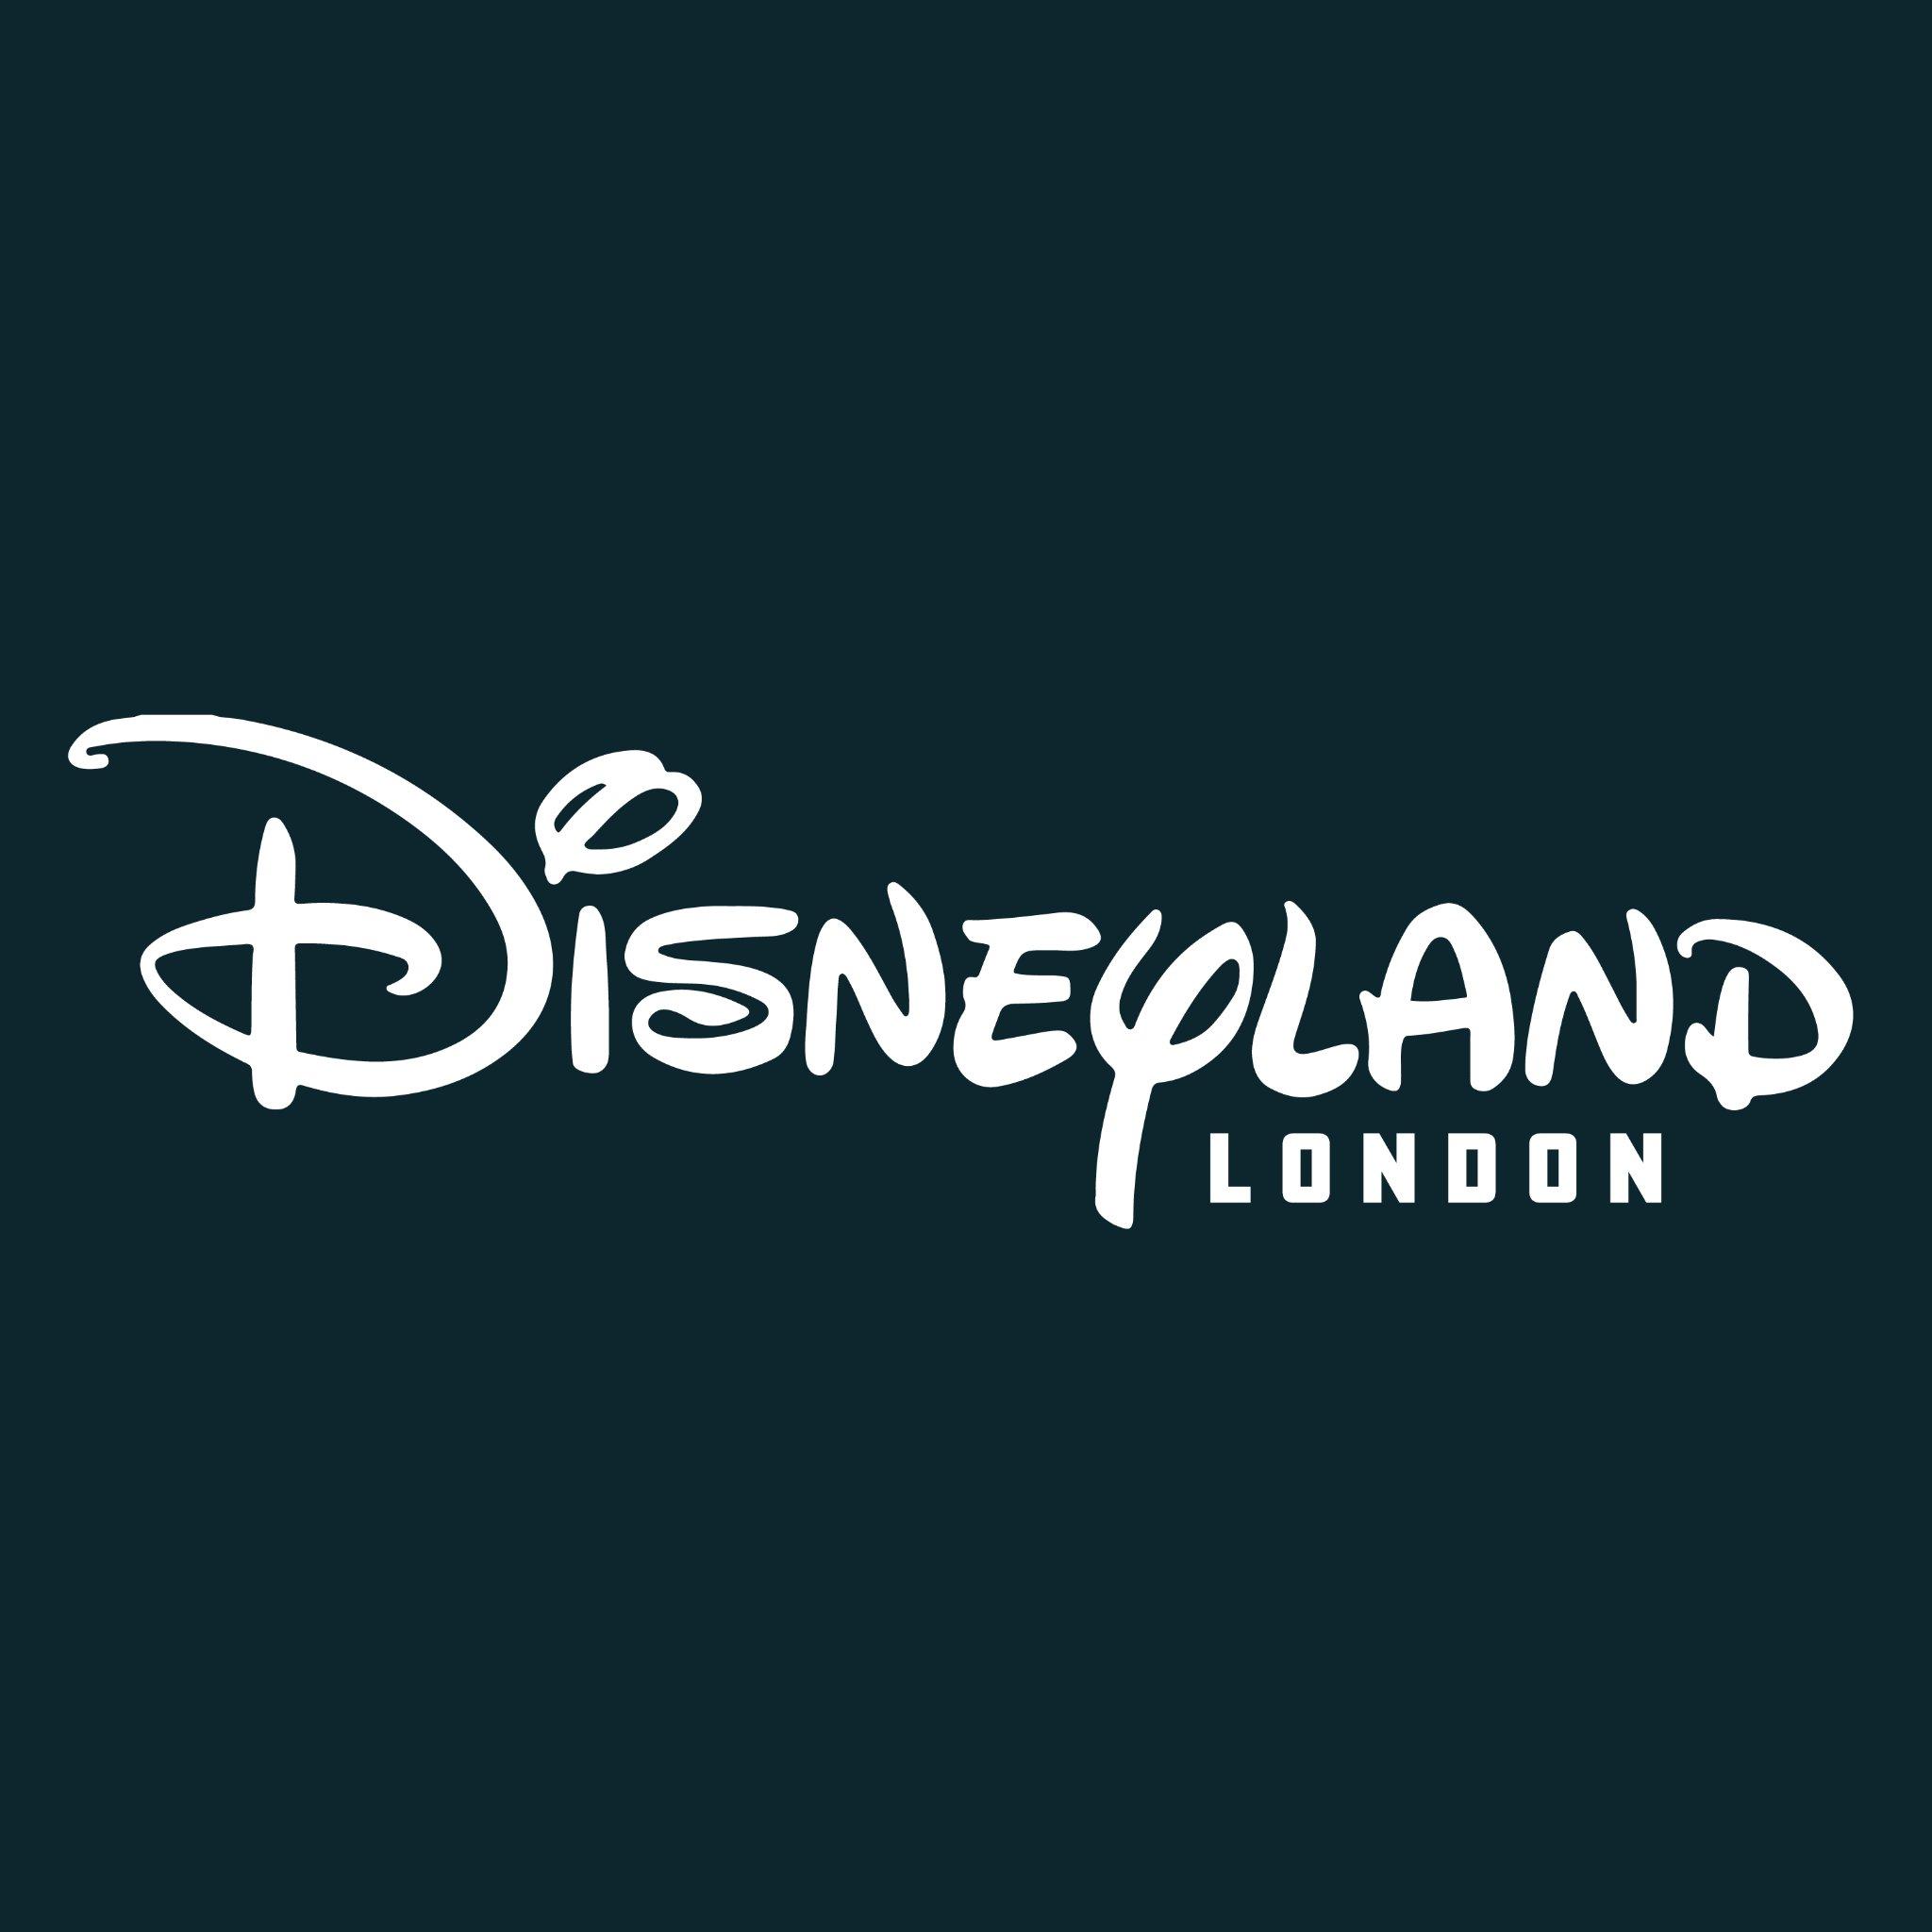 Disneyland London Disneyland Ldn Twitter